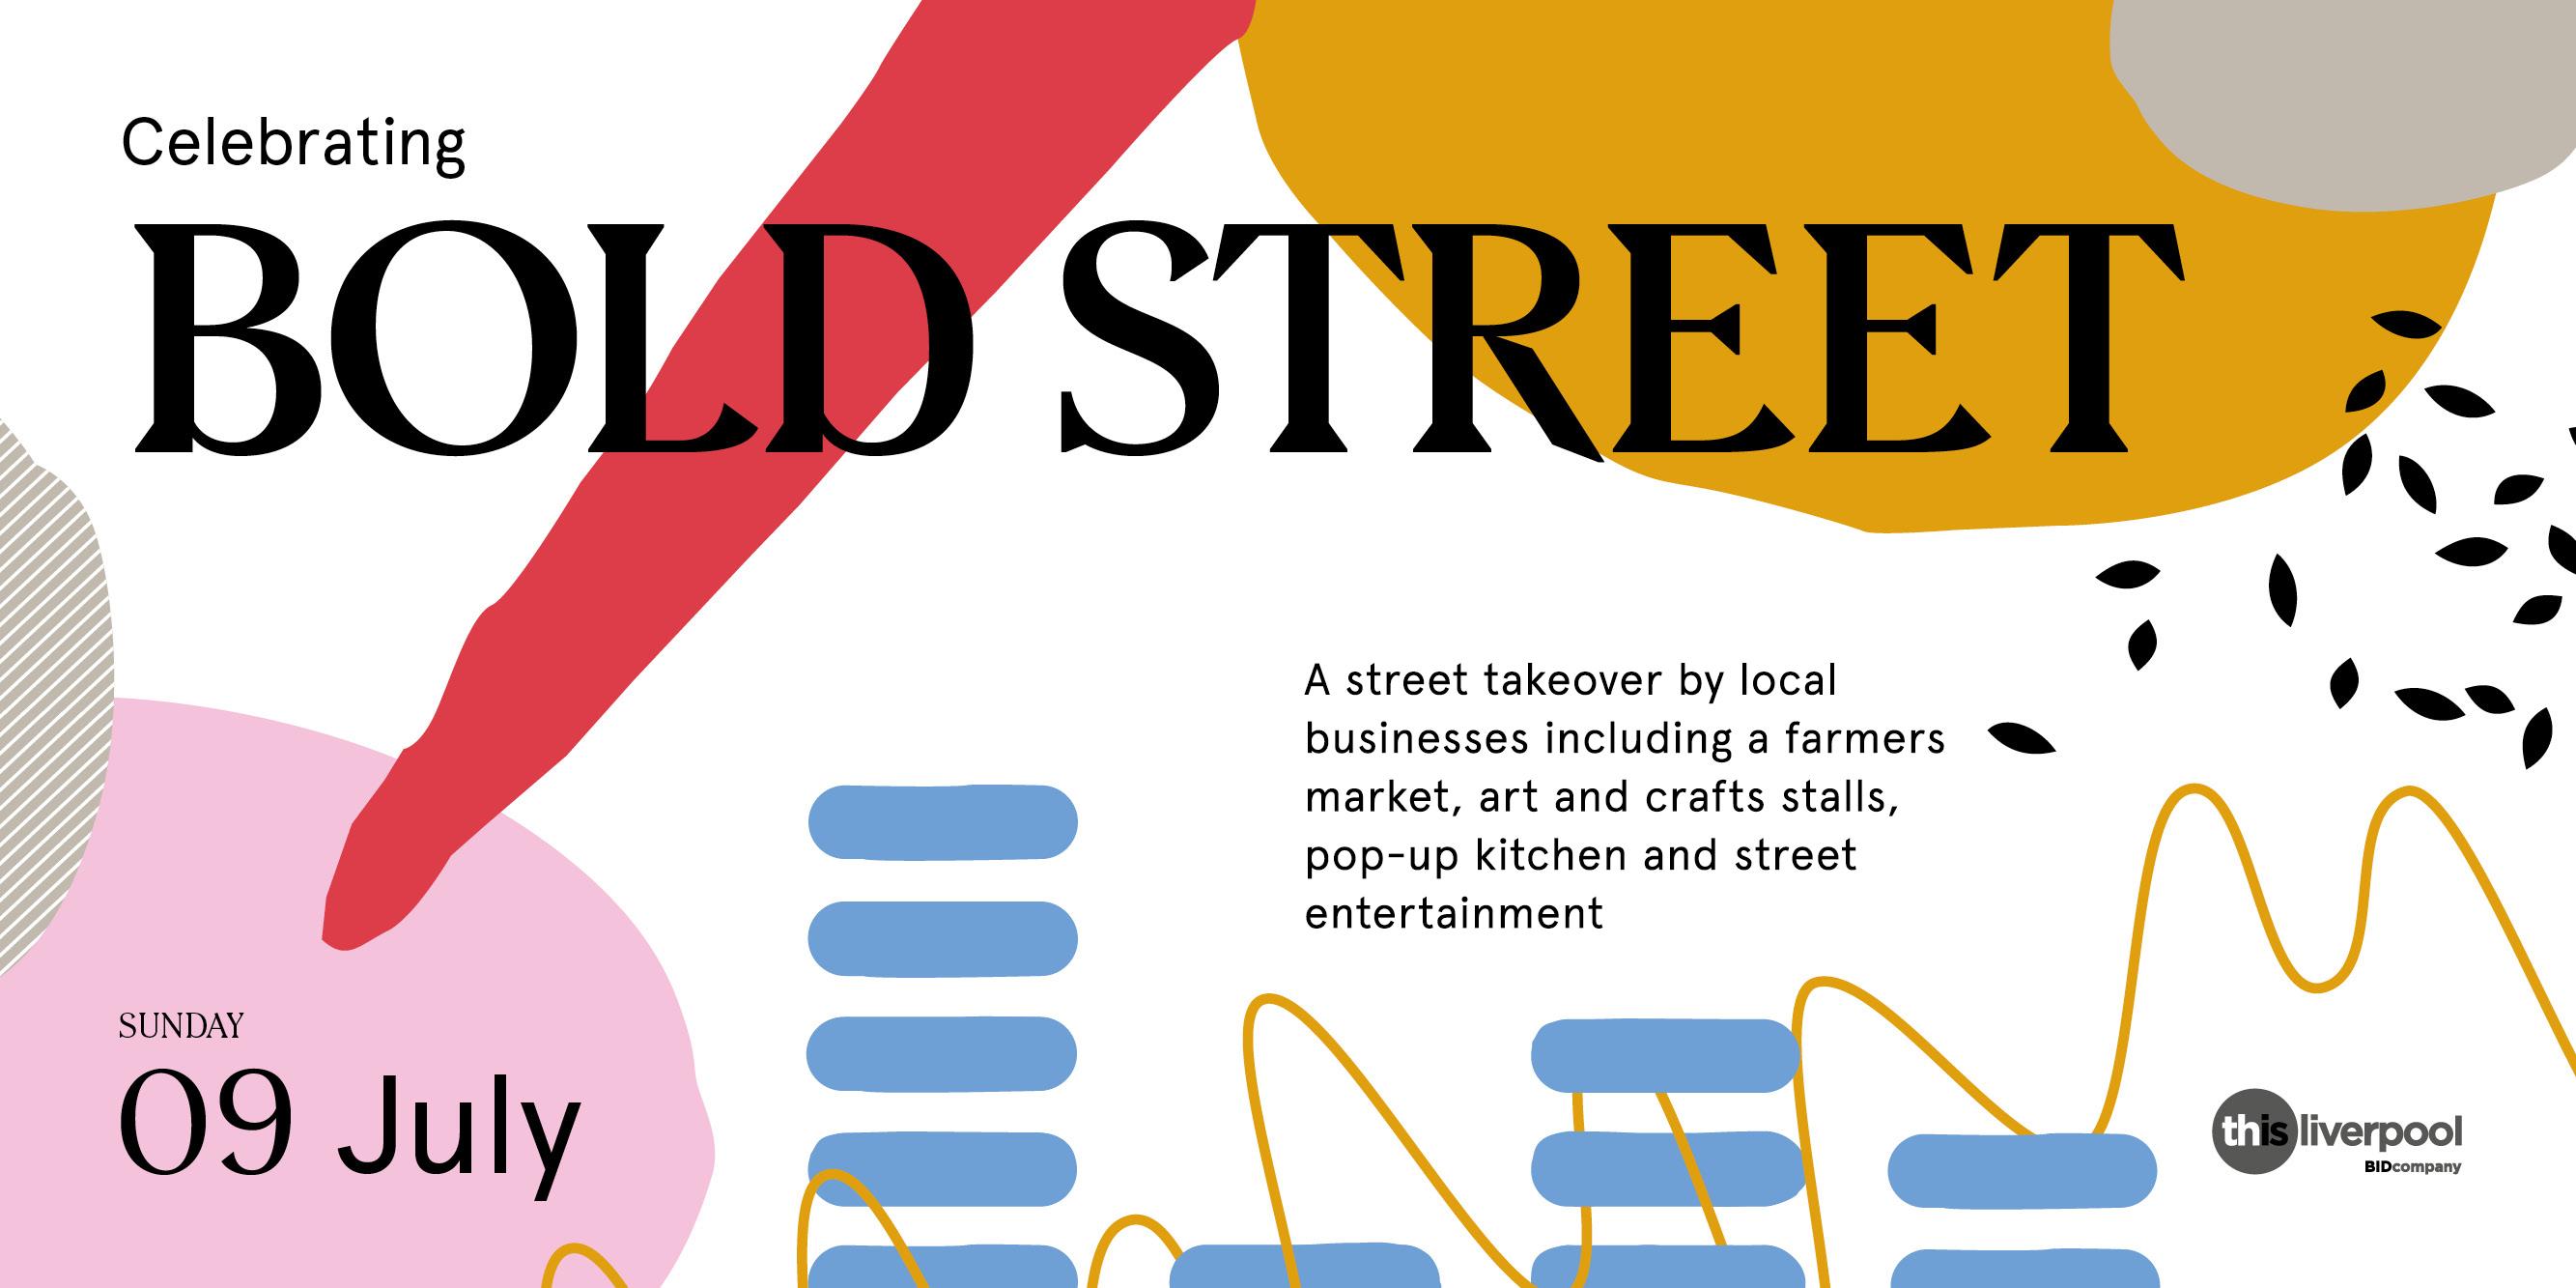 Bold Street: Celebrating Bold Street